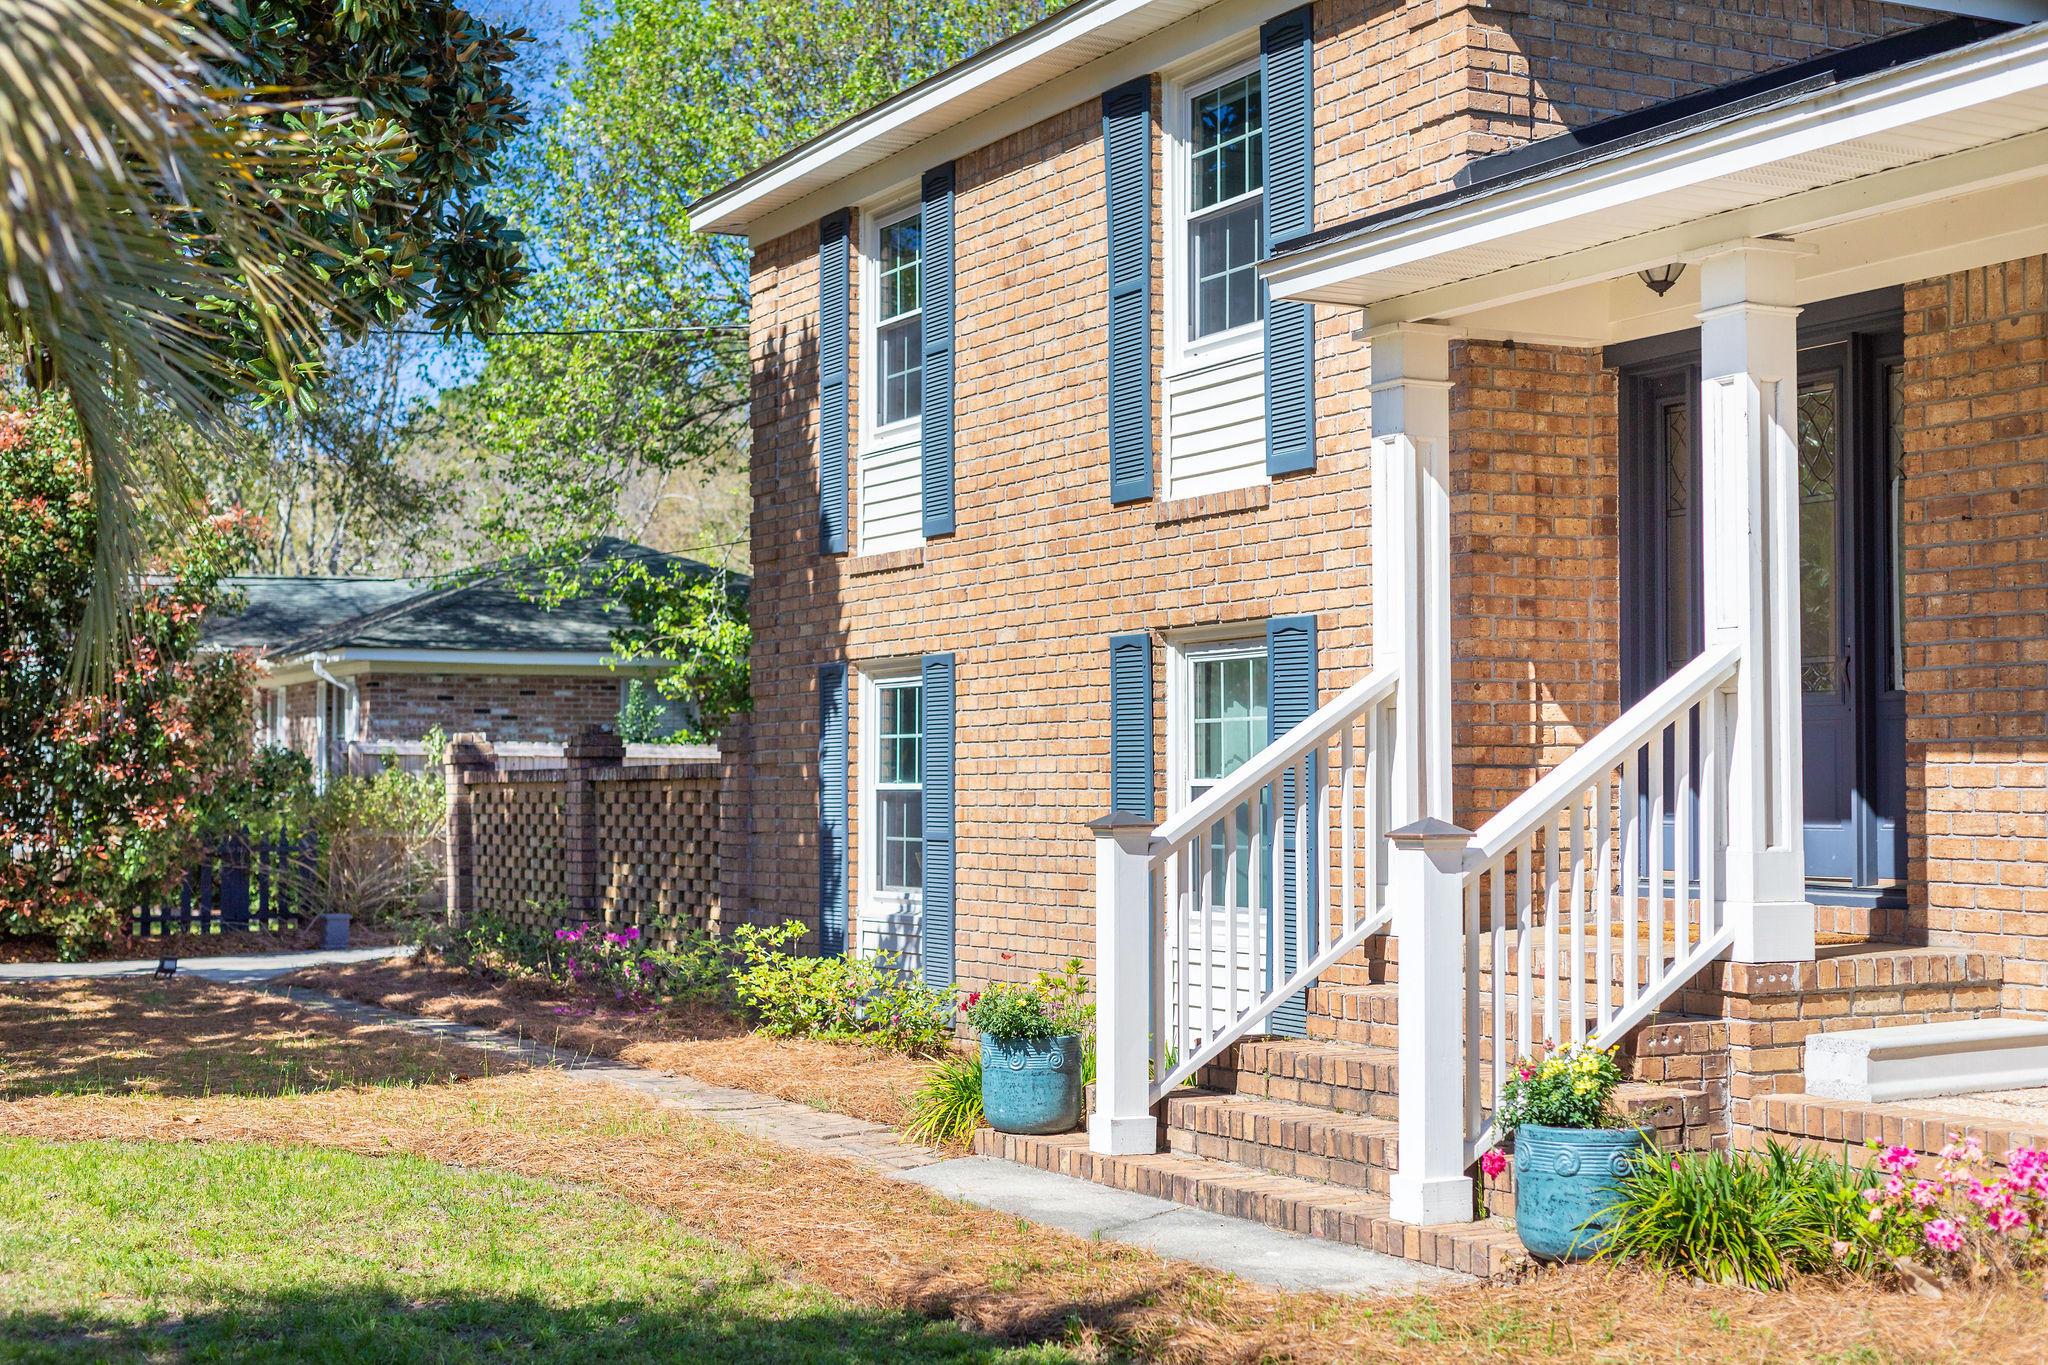 Cooper Estates Homes For Sale - 1058 Cottingham, Mount Pleasant, SC - 0